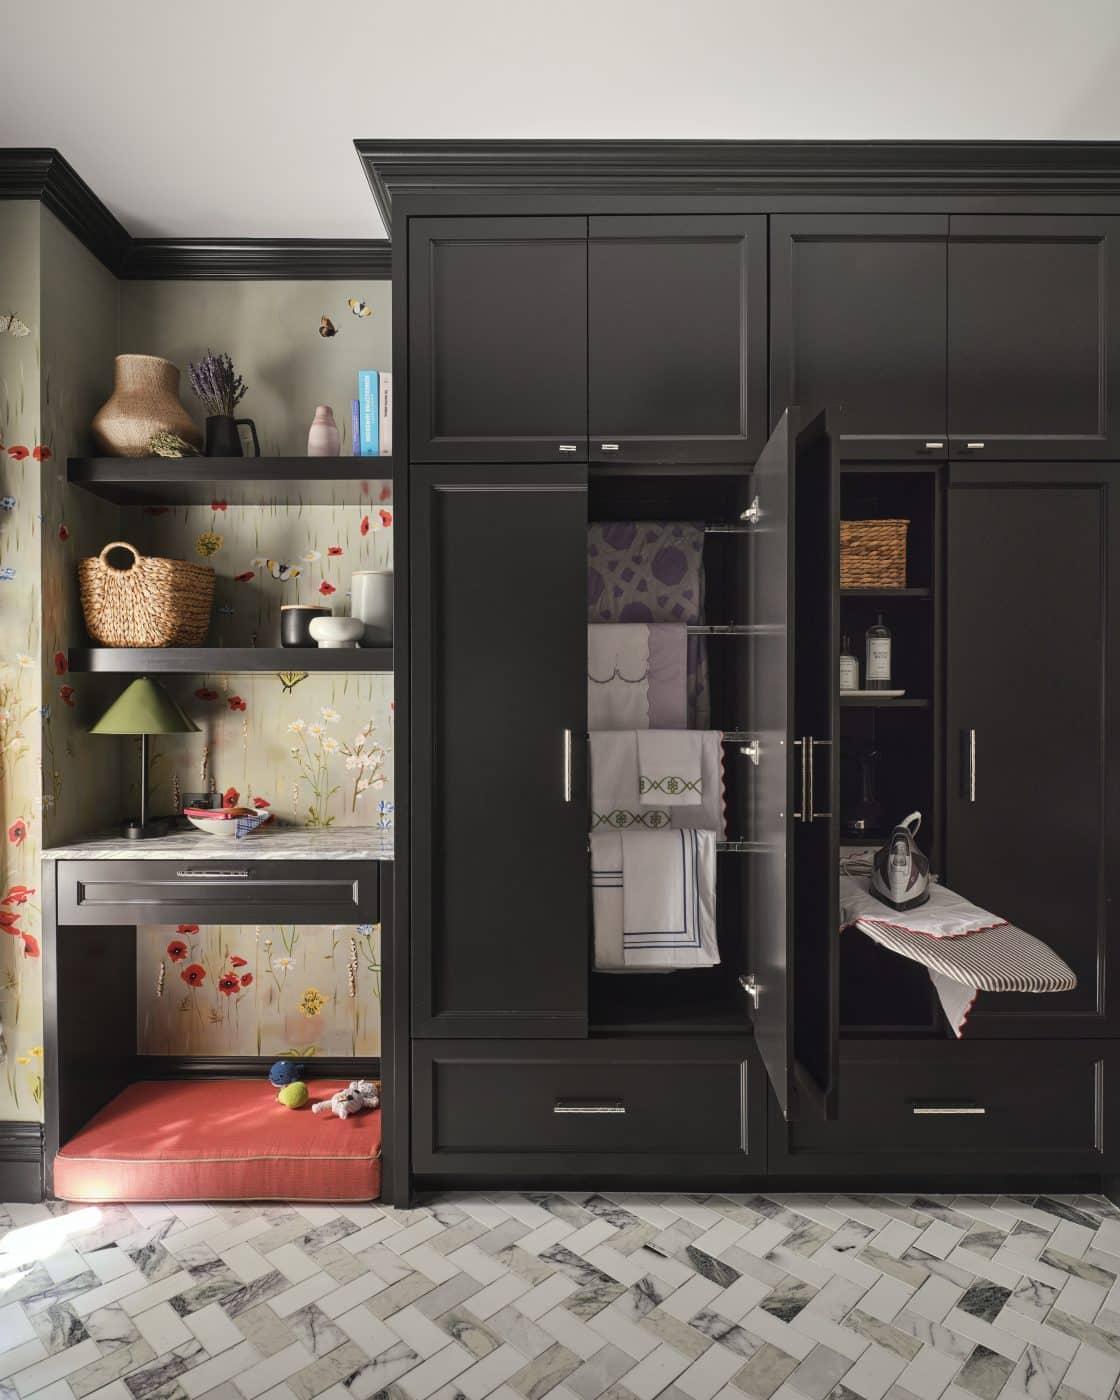 Laundry room designed by Kathleen Walsh